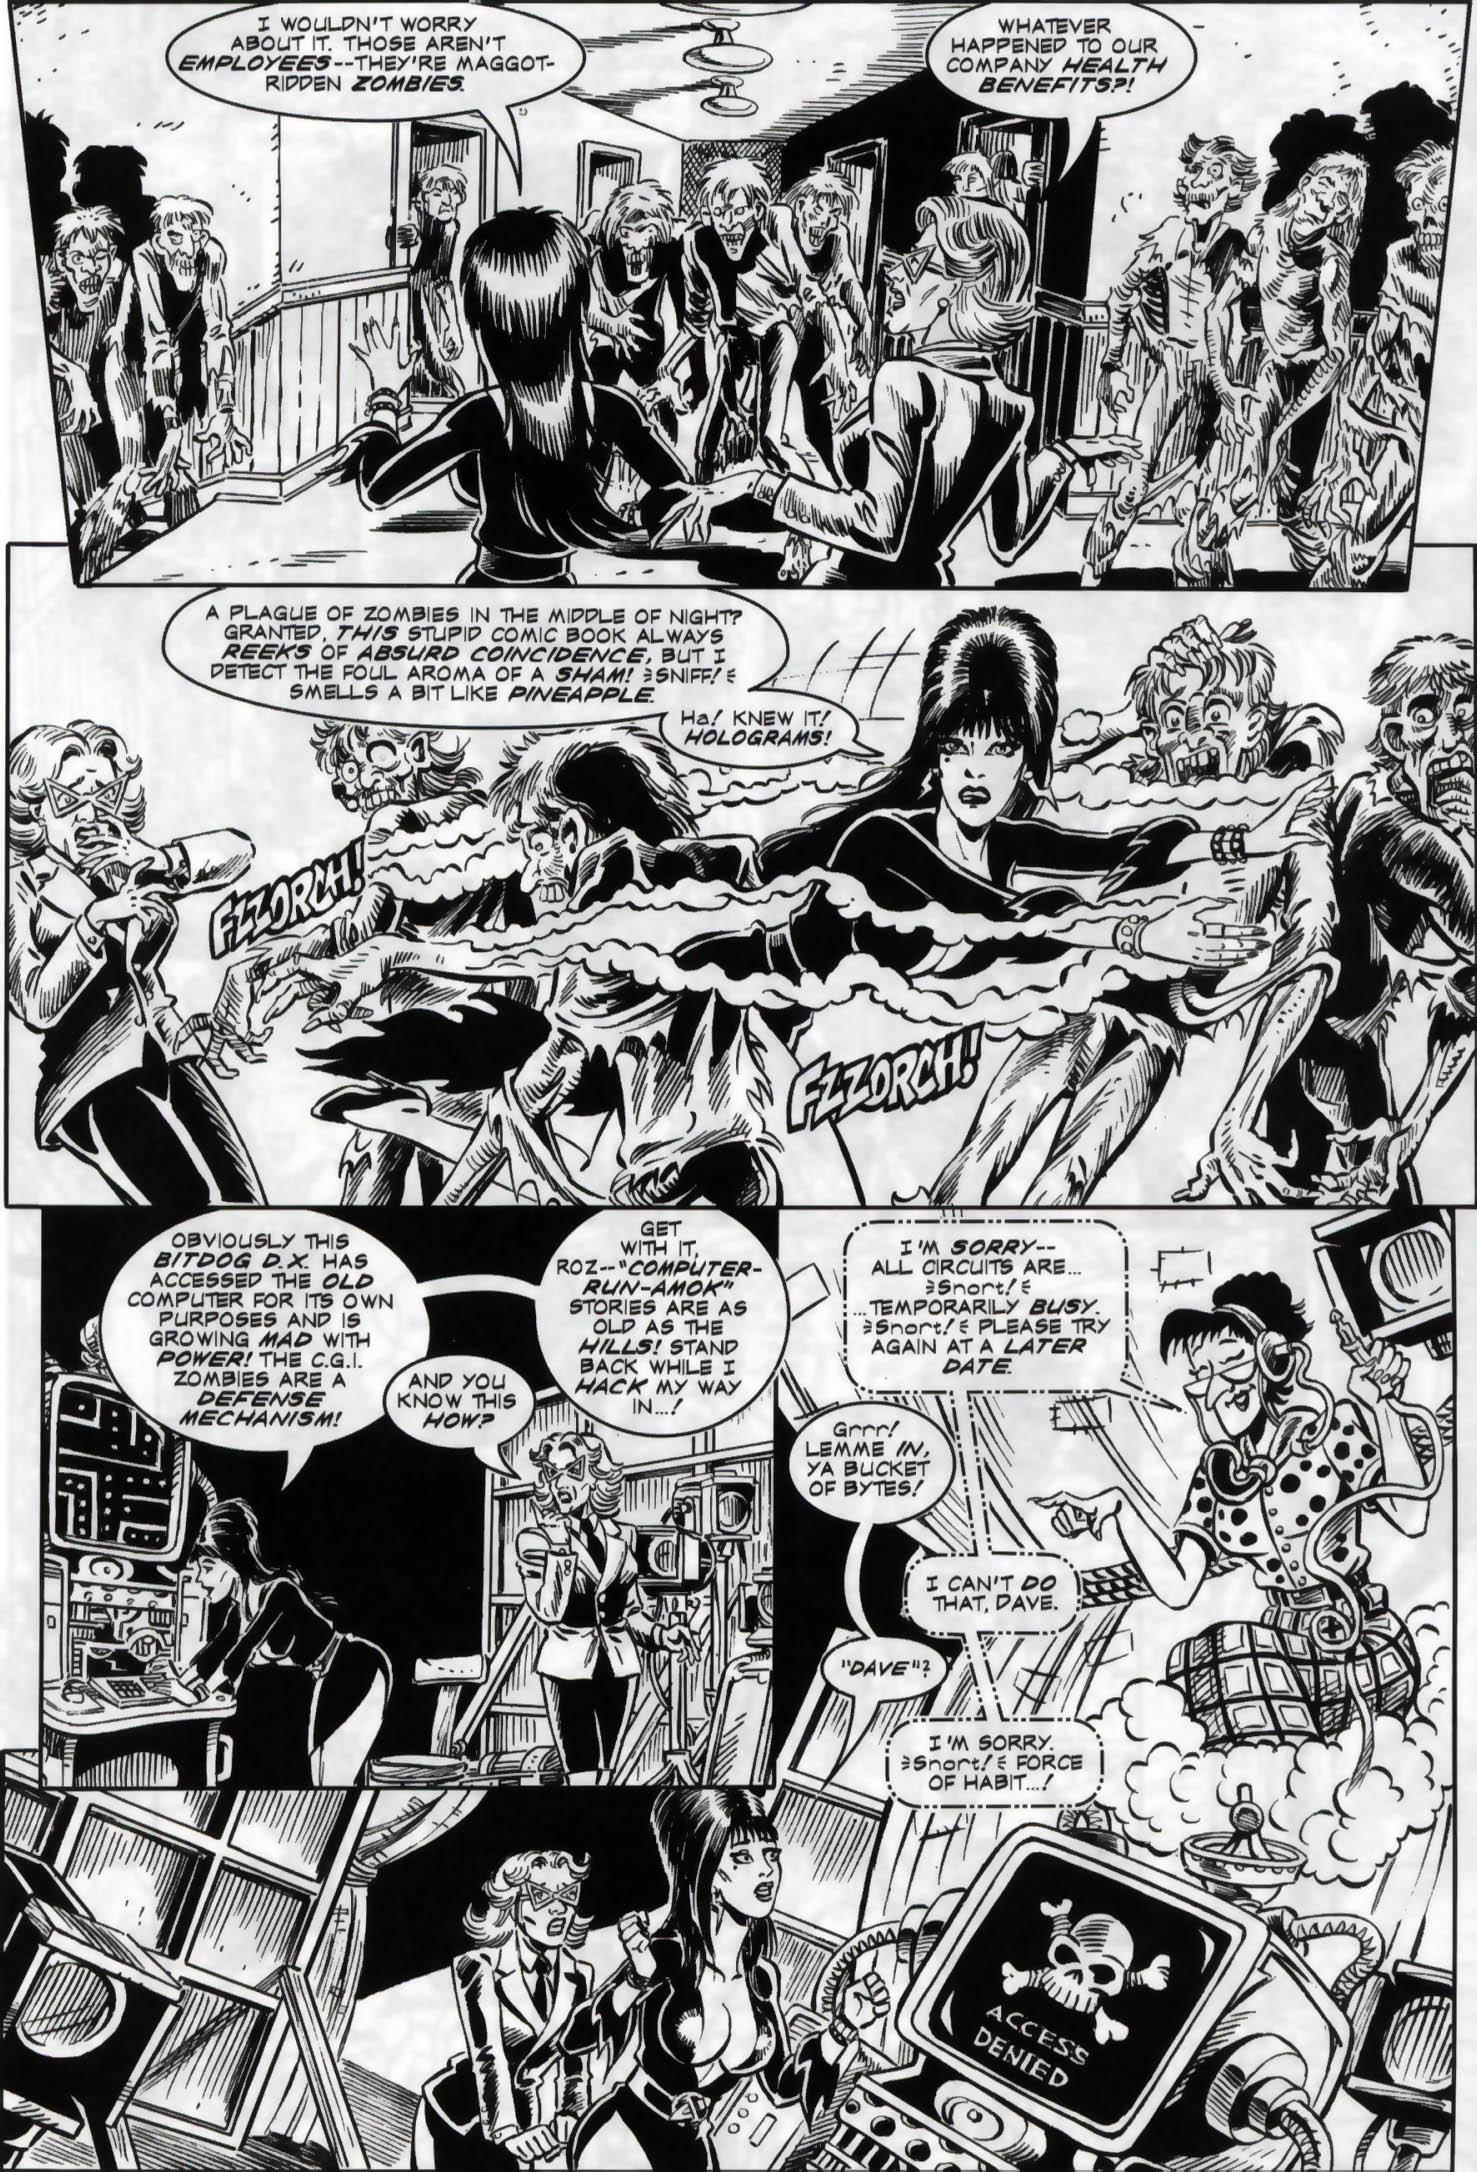 Read online Elvira, Mistress of the Dark comic -  Issue #119 - 11